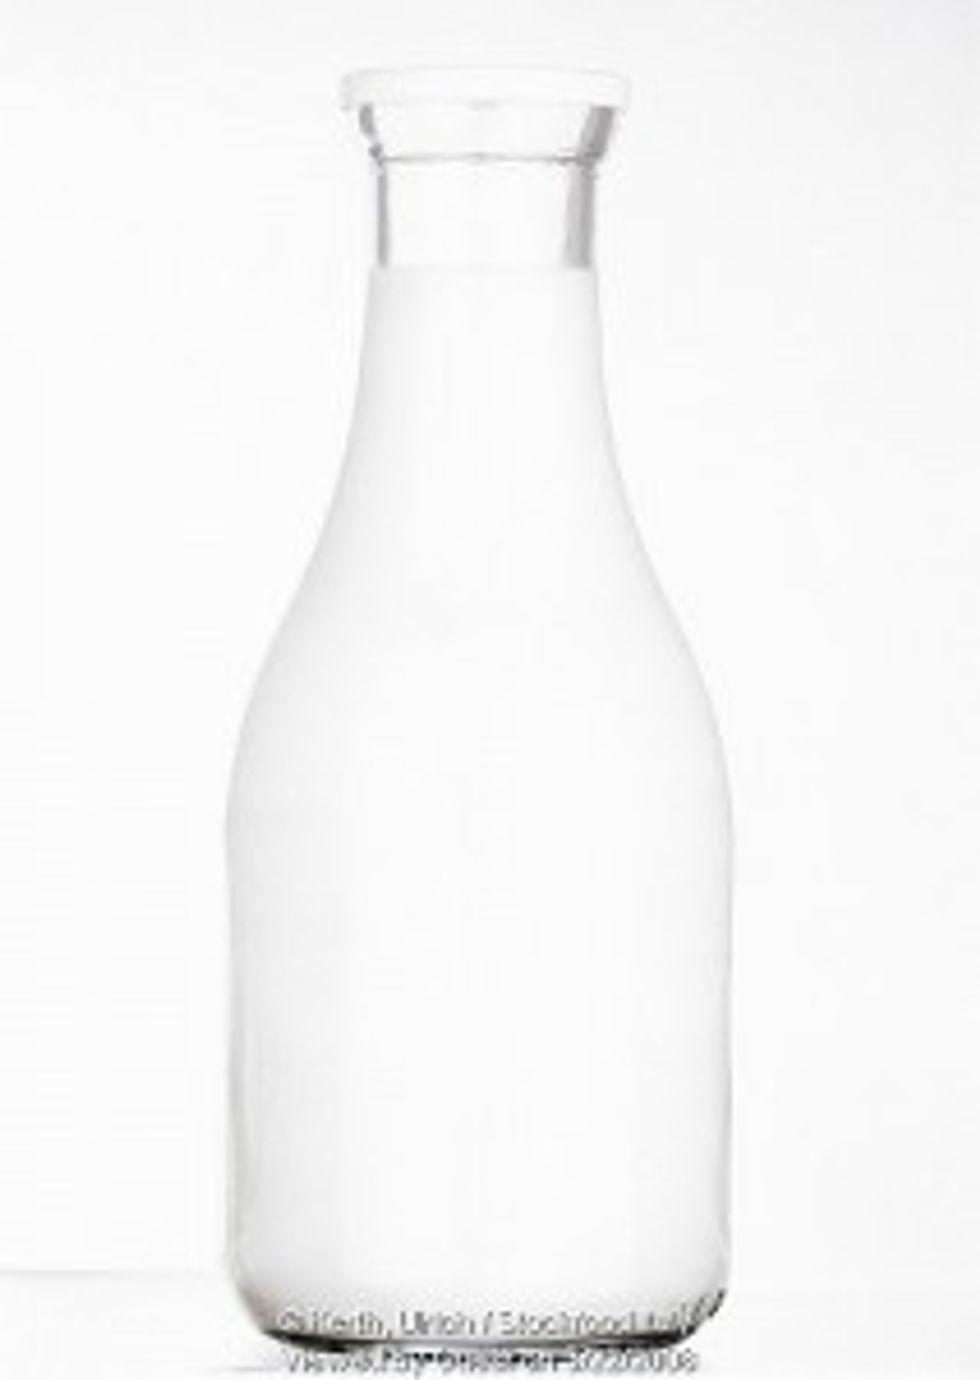 Ricordati il latte. Ospite: Christian Raimo